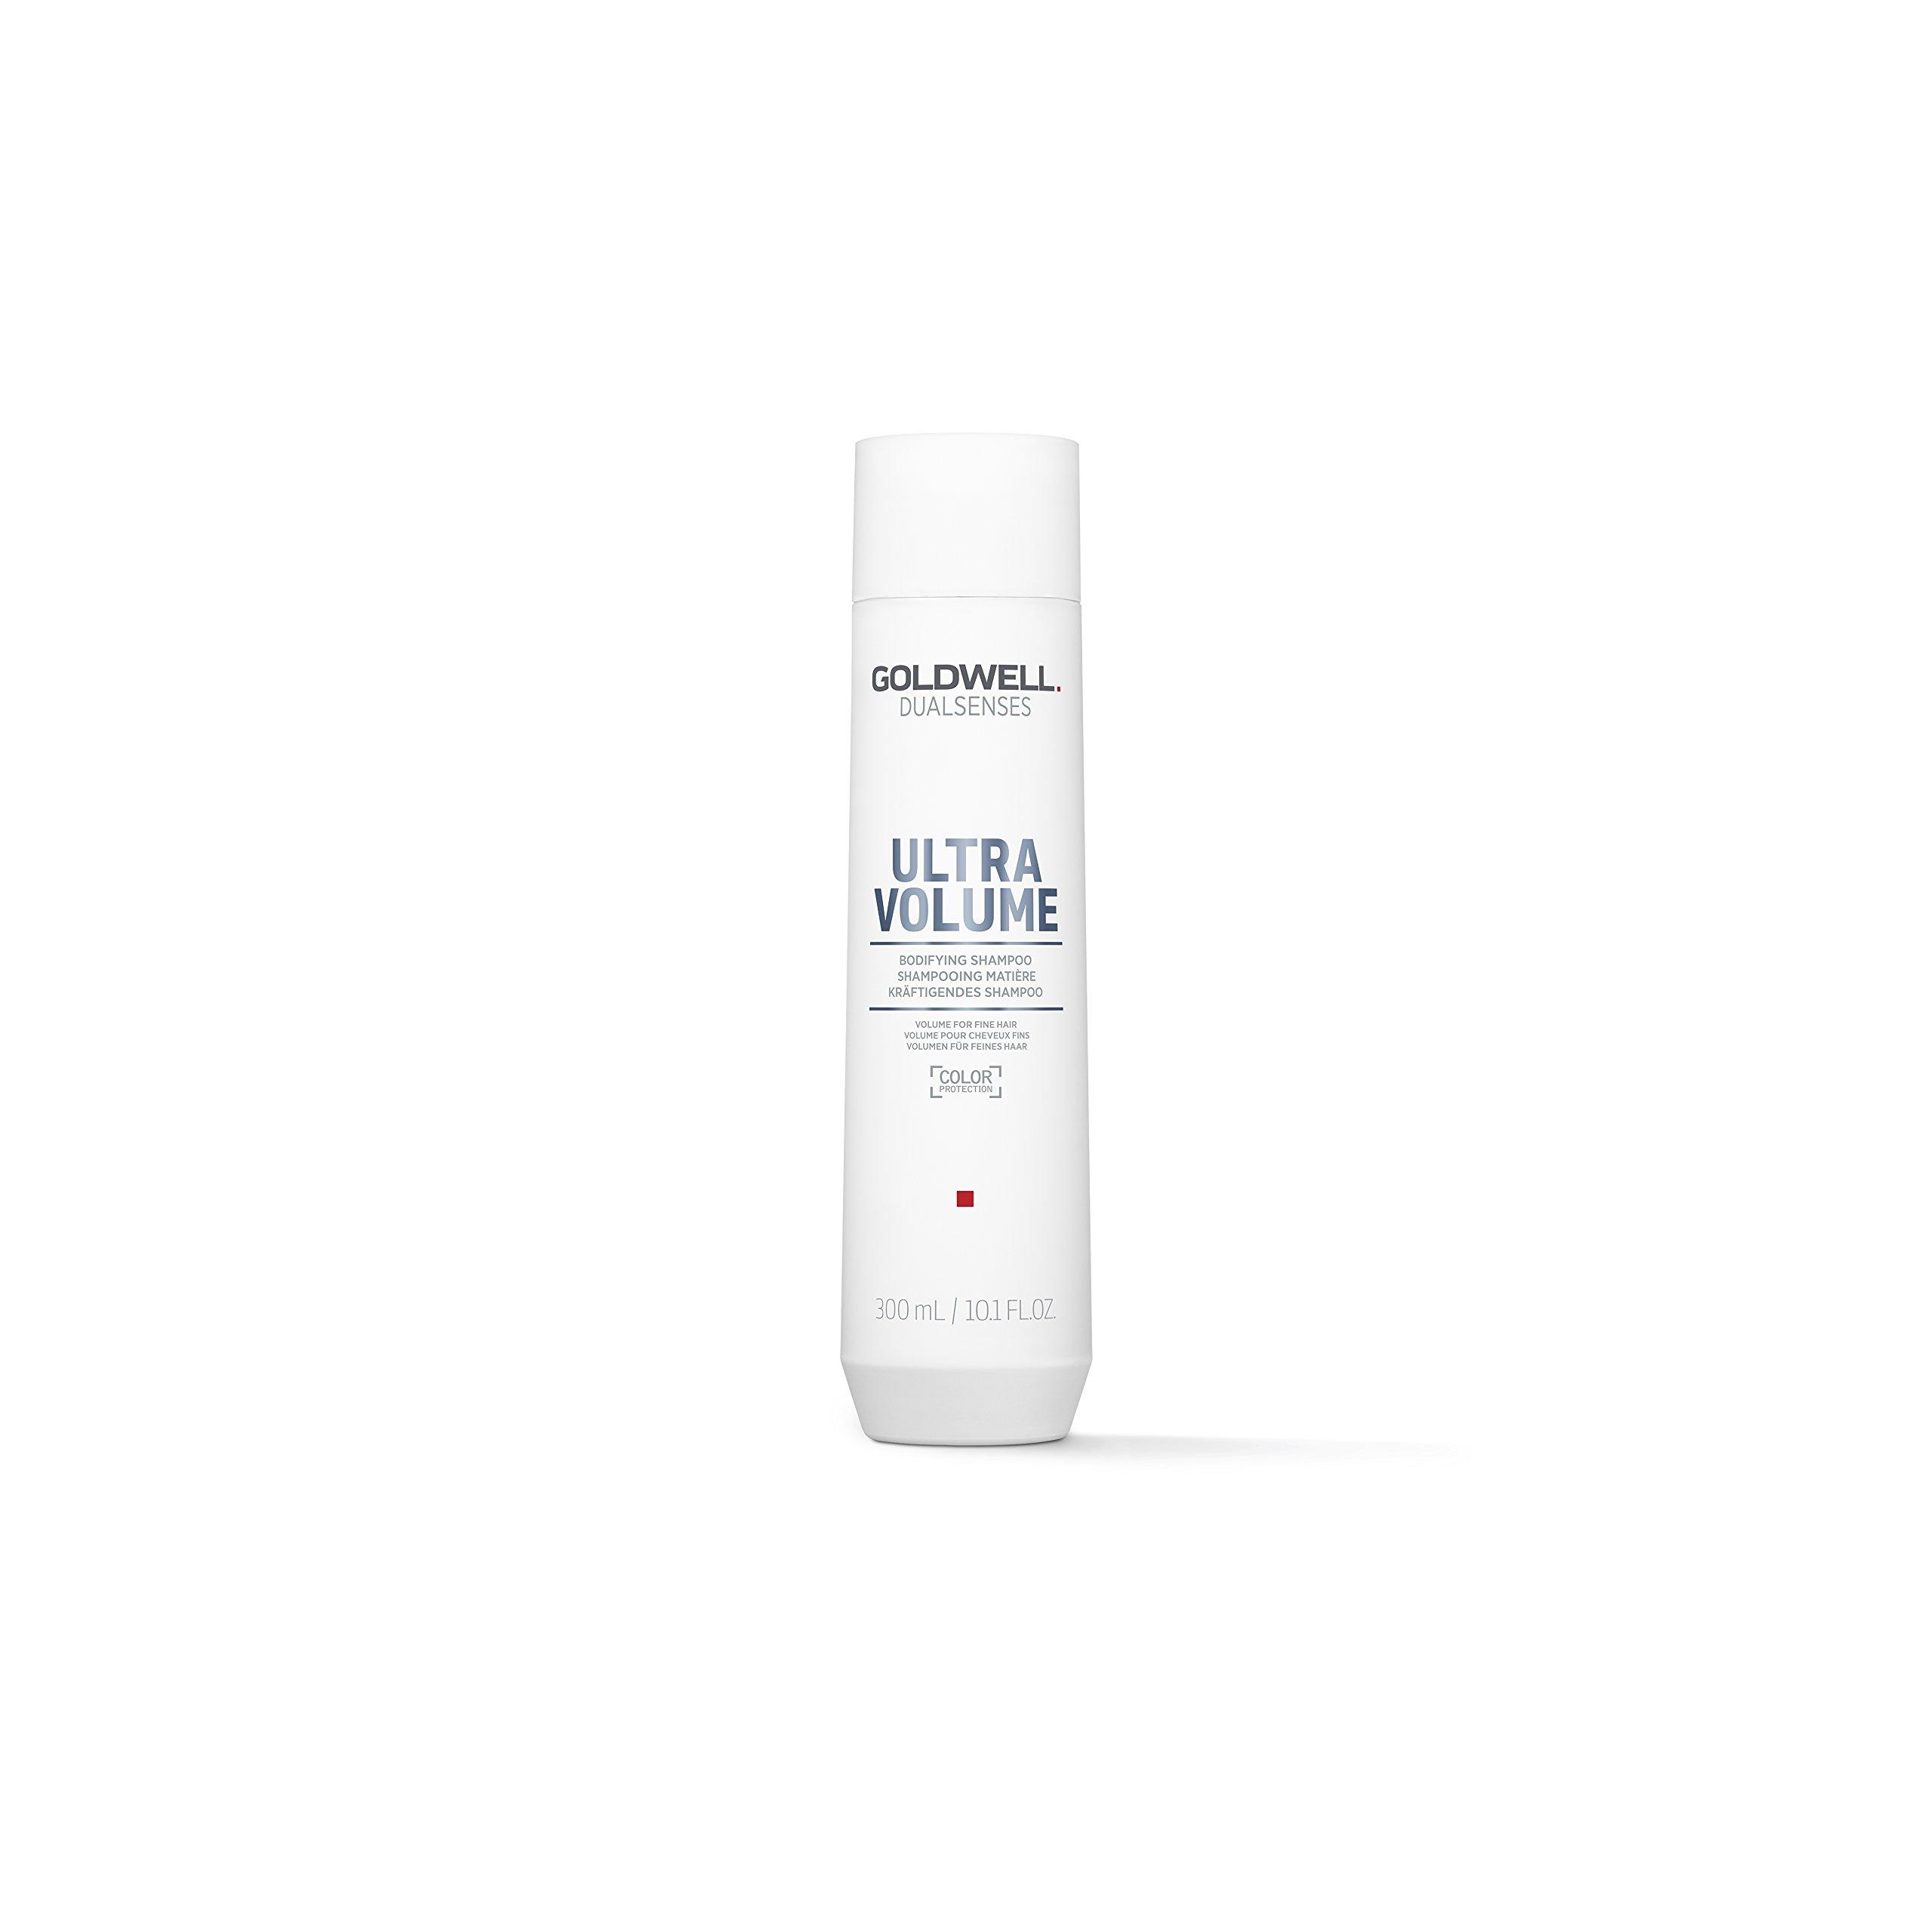 Goldwell Dualsenses Ultra Volume Bodifying Shampoo Root Boost Fullness Body, Color Protect - 10.1oz